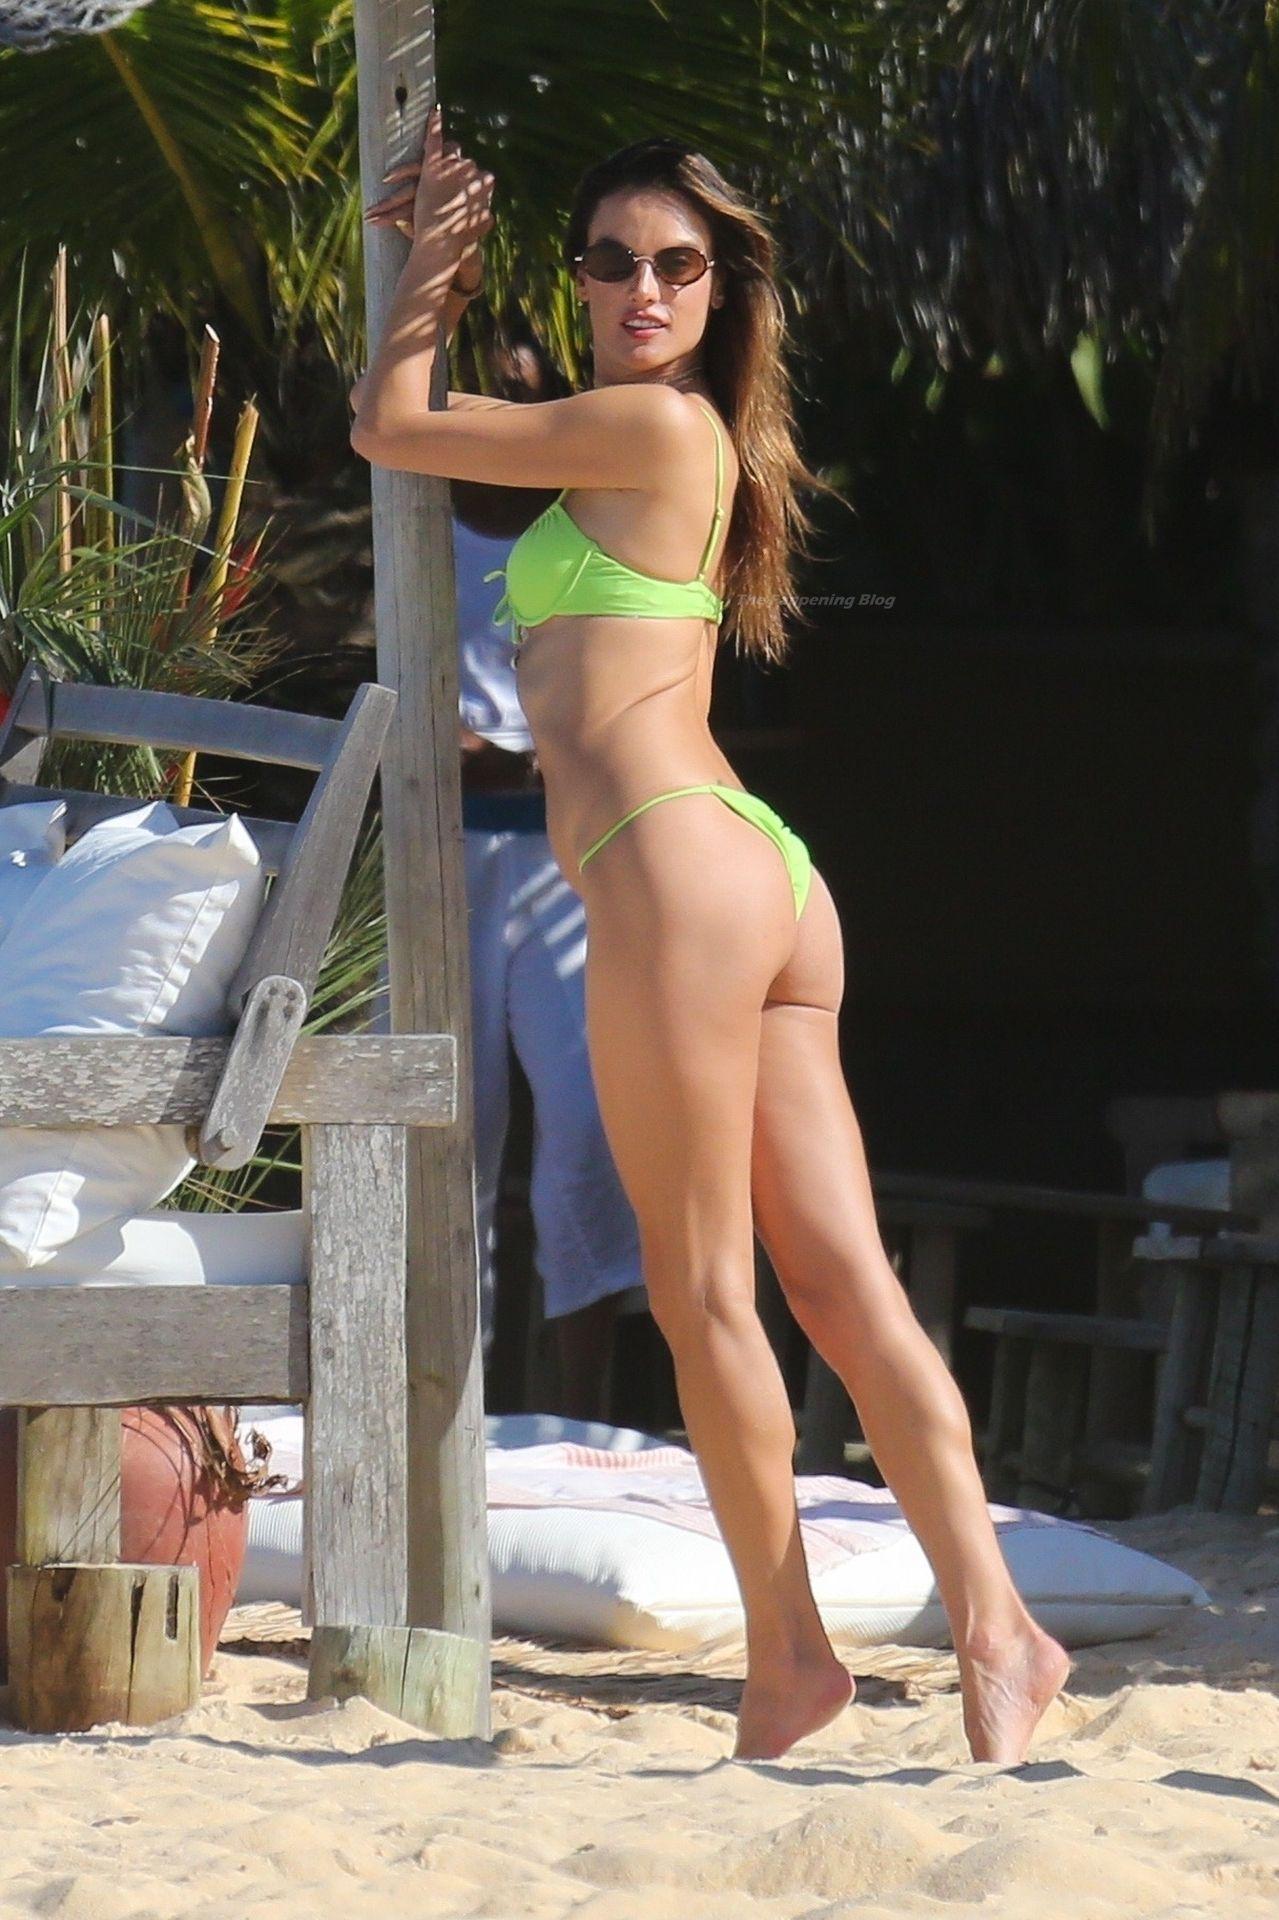 Alessandra-Ambrosio-Sexy-The-Fappening-Blog-241.jpg